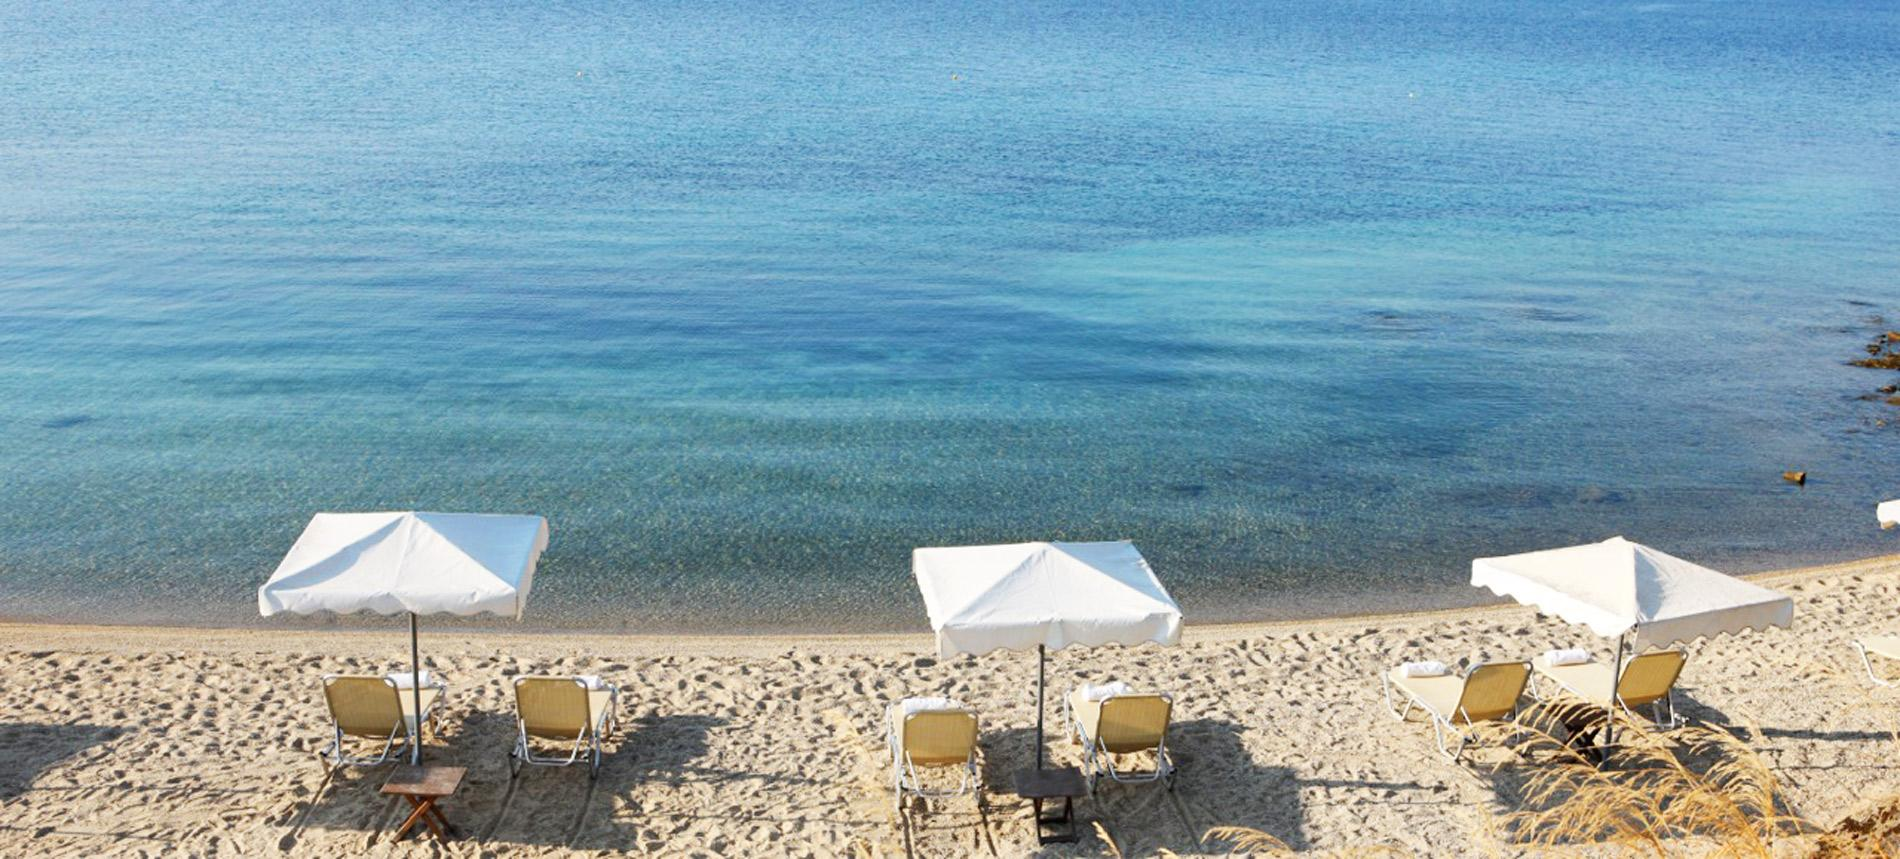 agionissi-beach